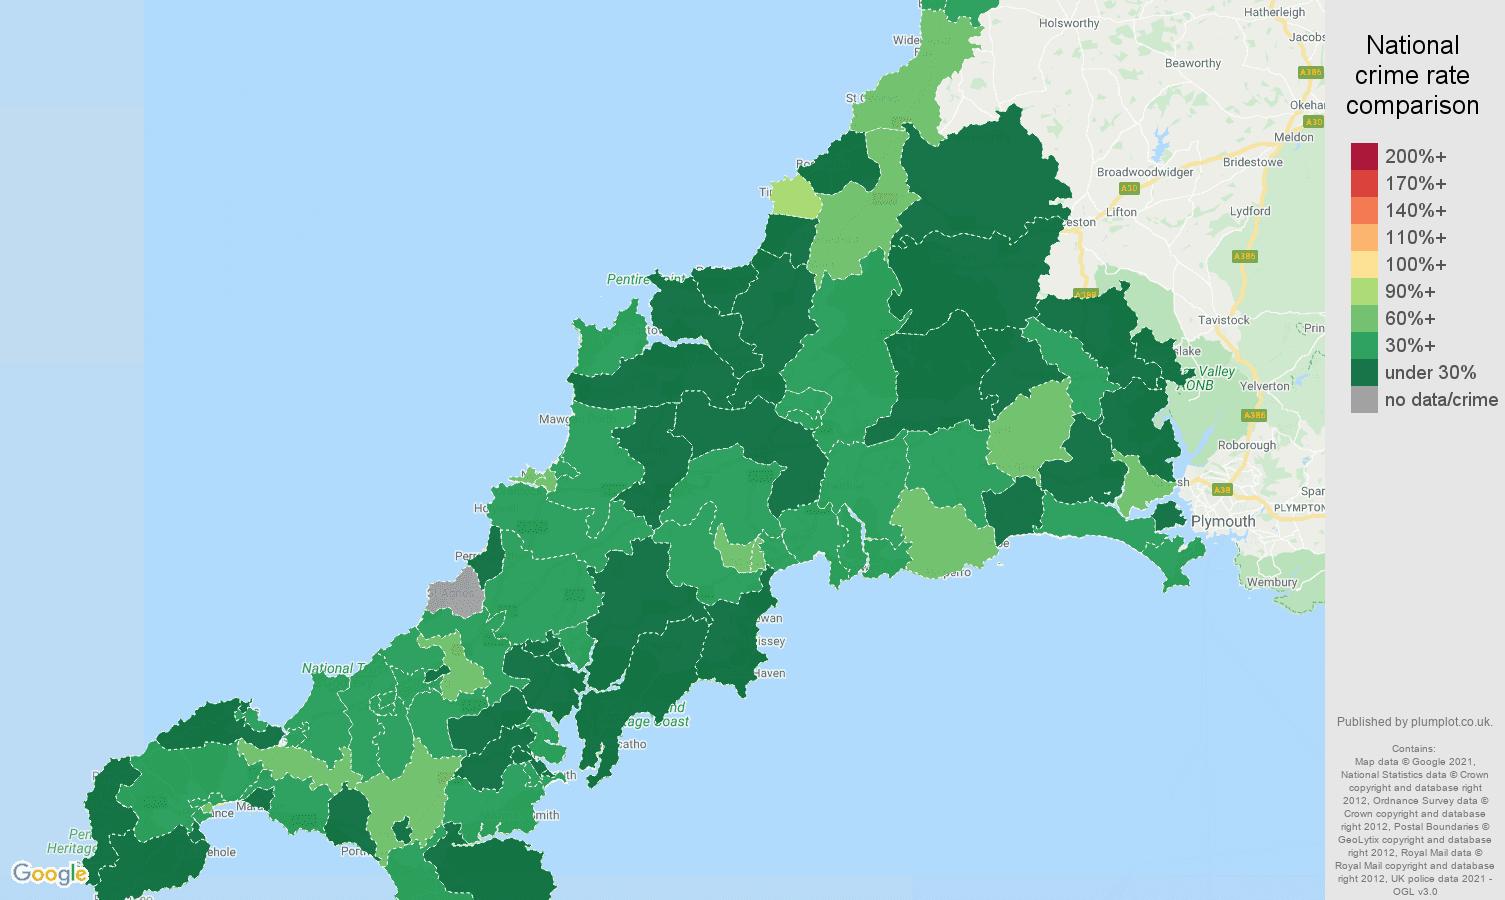 Cornwall burglary crime rate comparison map